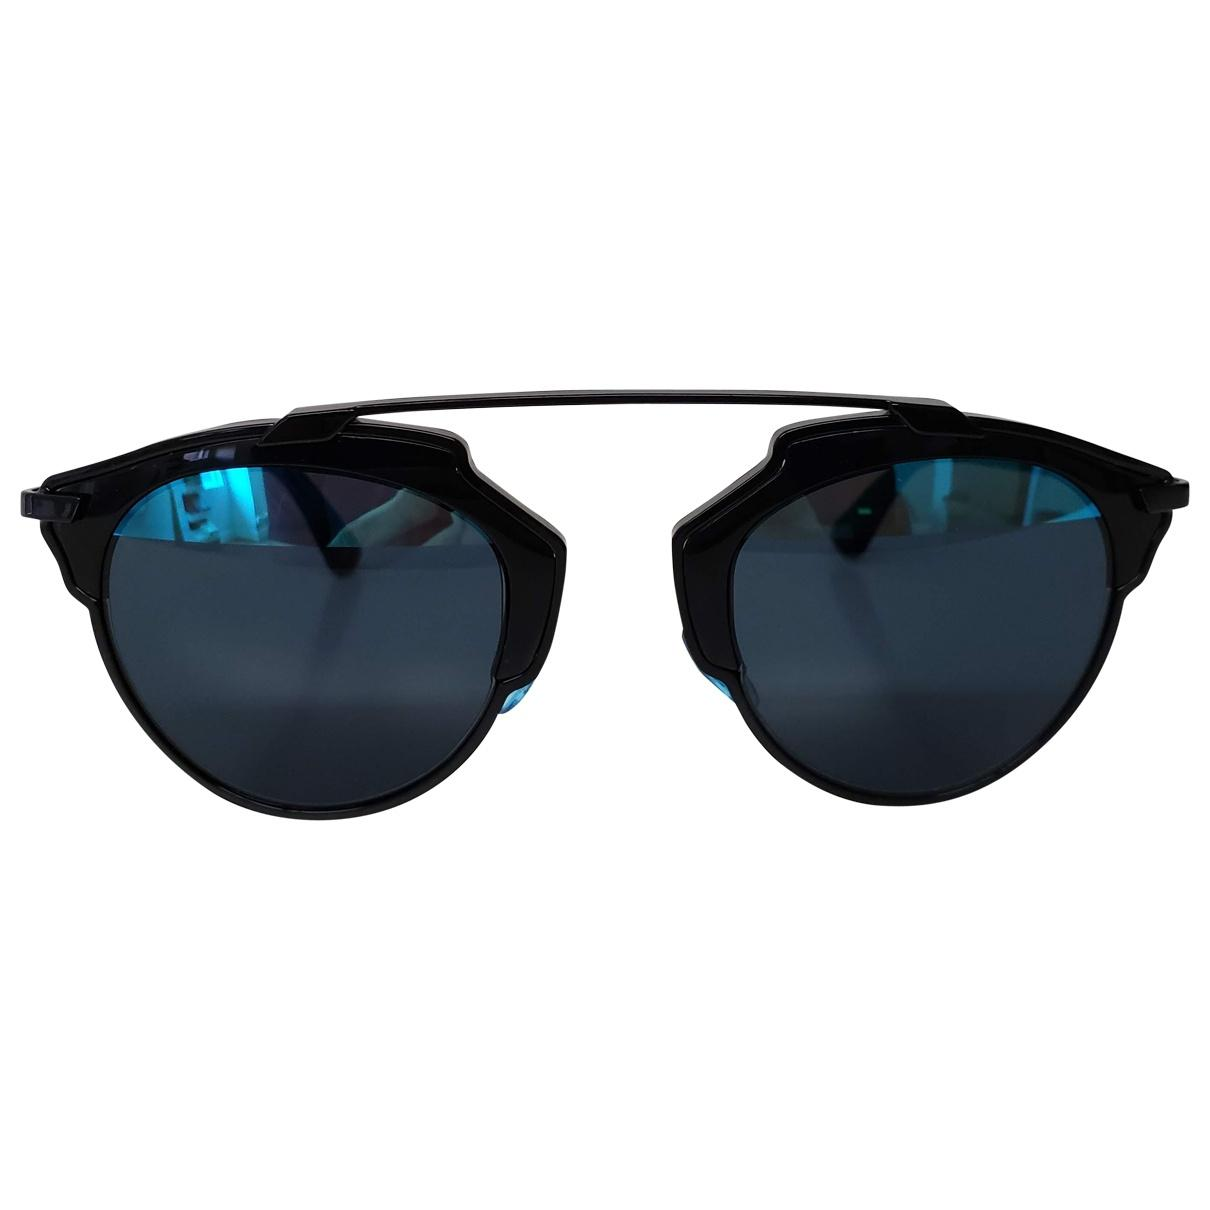 ac1c224462b Dior So Real Aviator Sunglasses in Black - Lyst